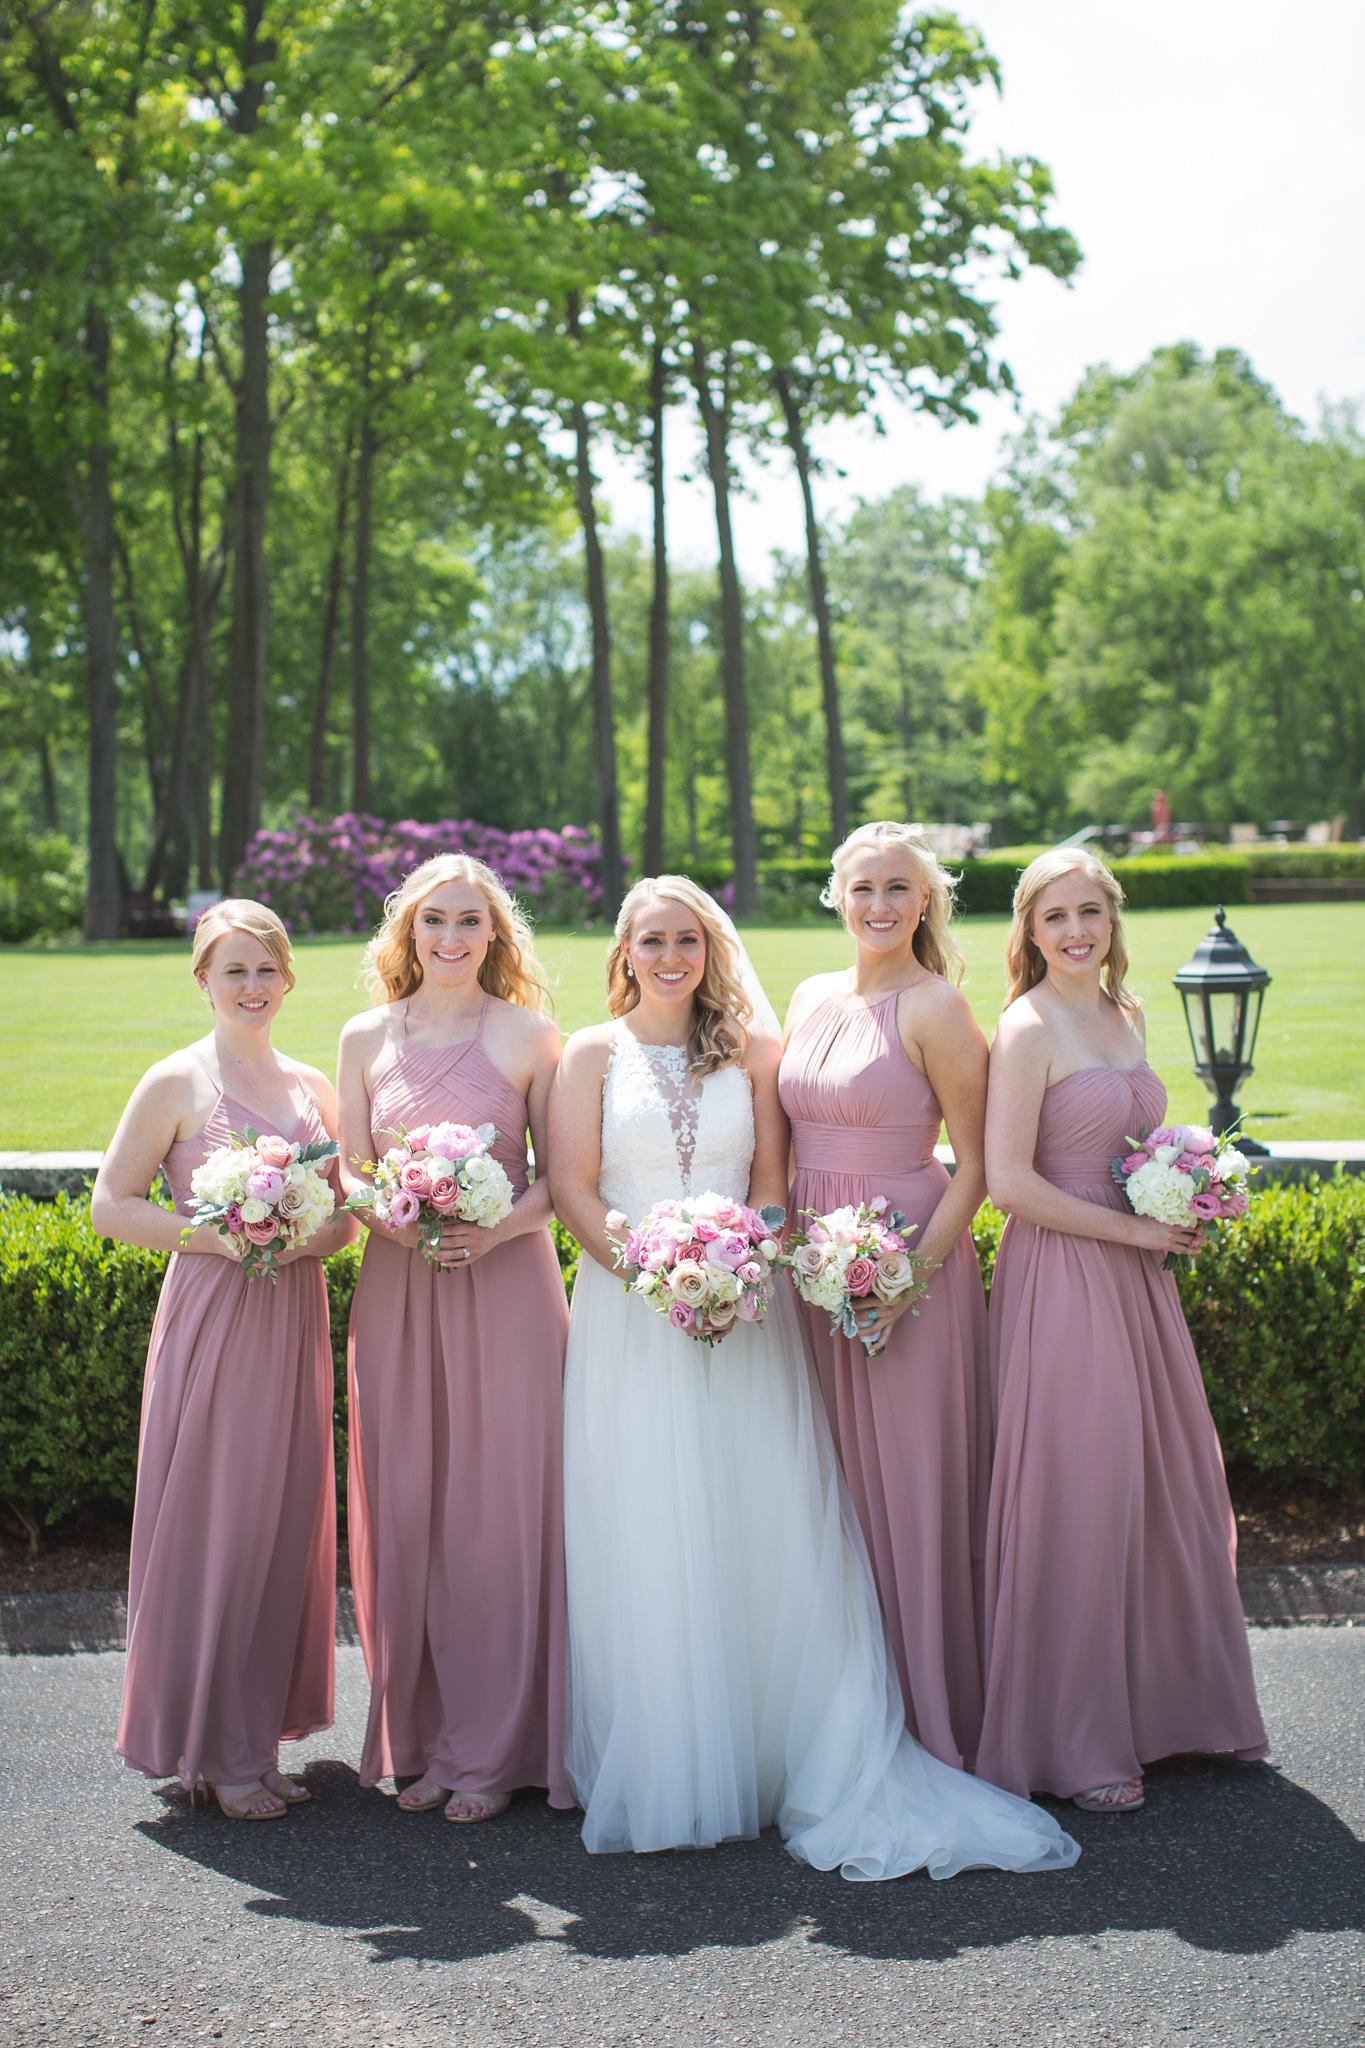 024-best-detroit-michigan-outdoor-wedding-photographer.jpg